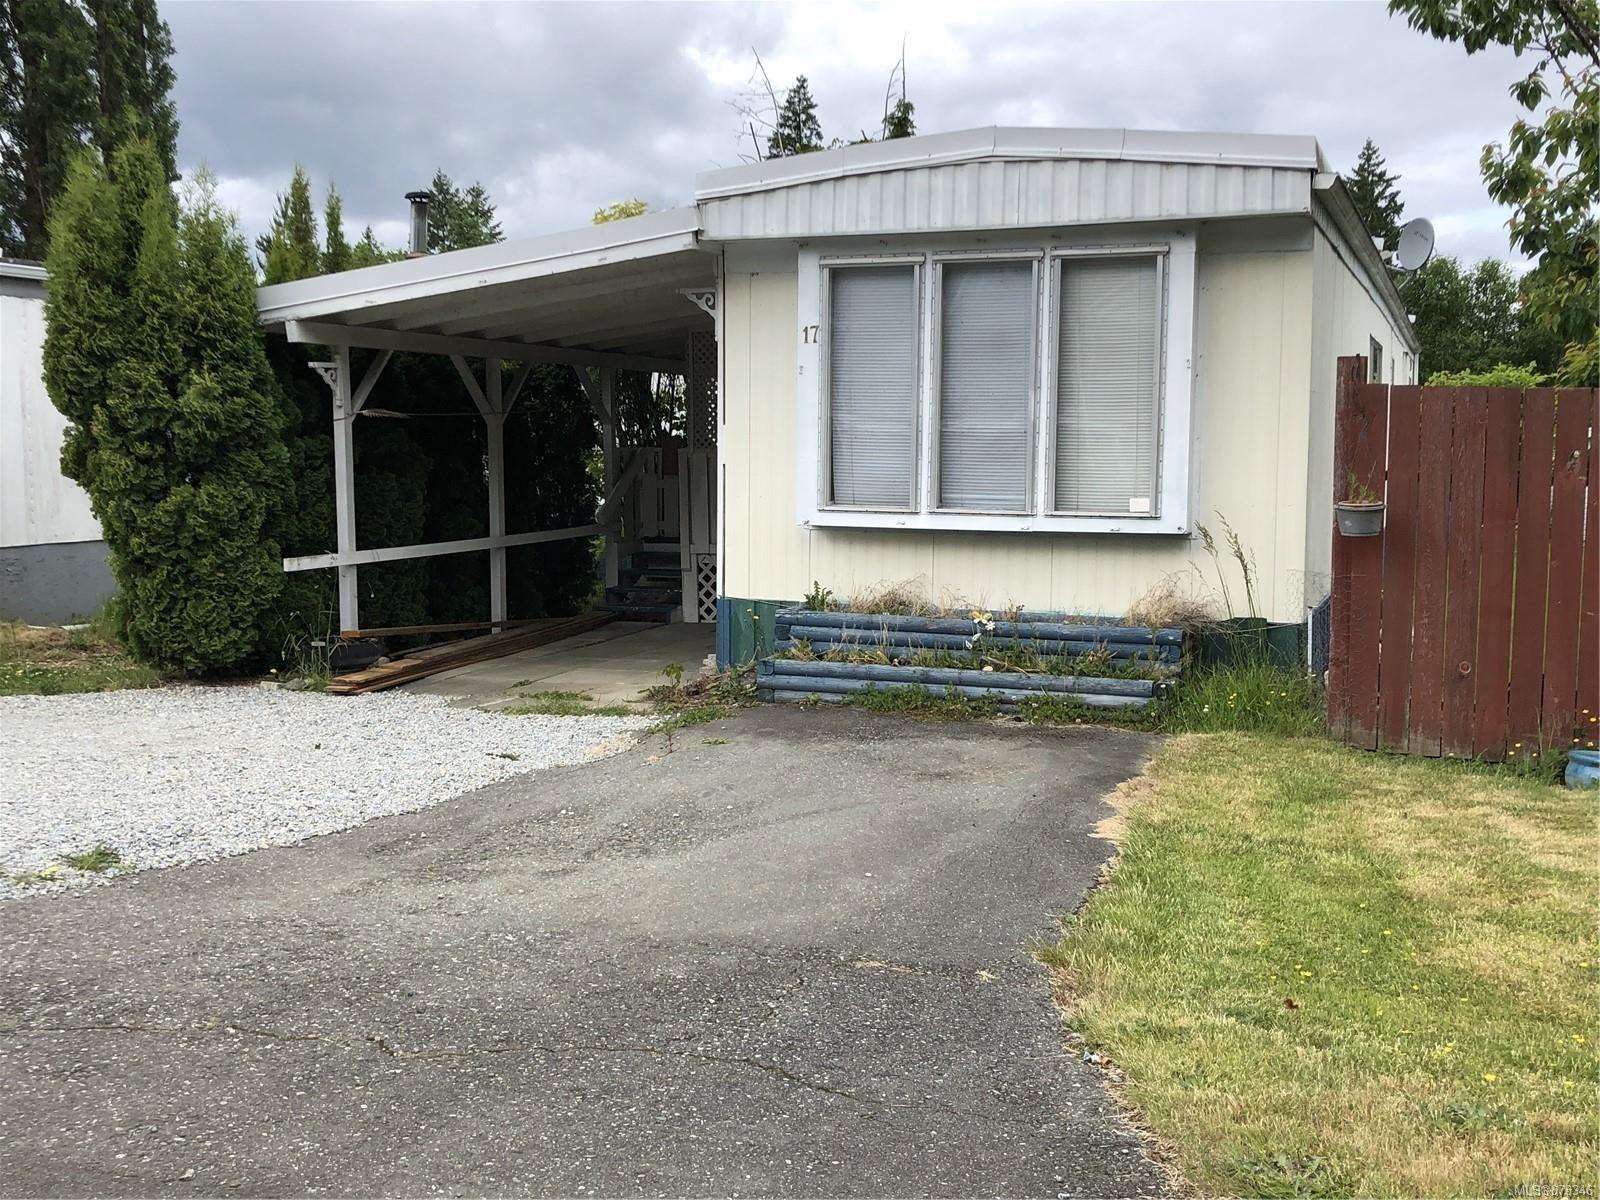 Main Photo: 17 2917 Alberni Hwy in : PA Alberni Valley Manufactured Home for sale (Port Alberni)  : MLS®# 878346